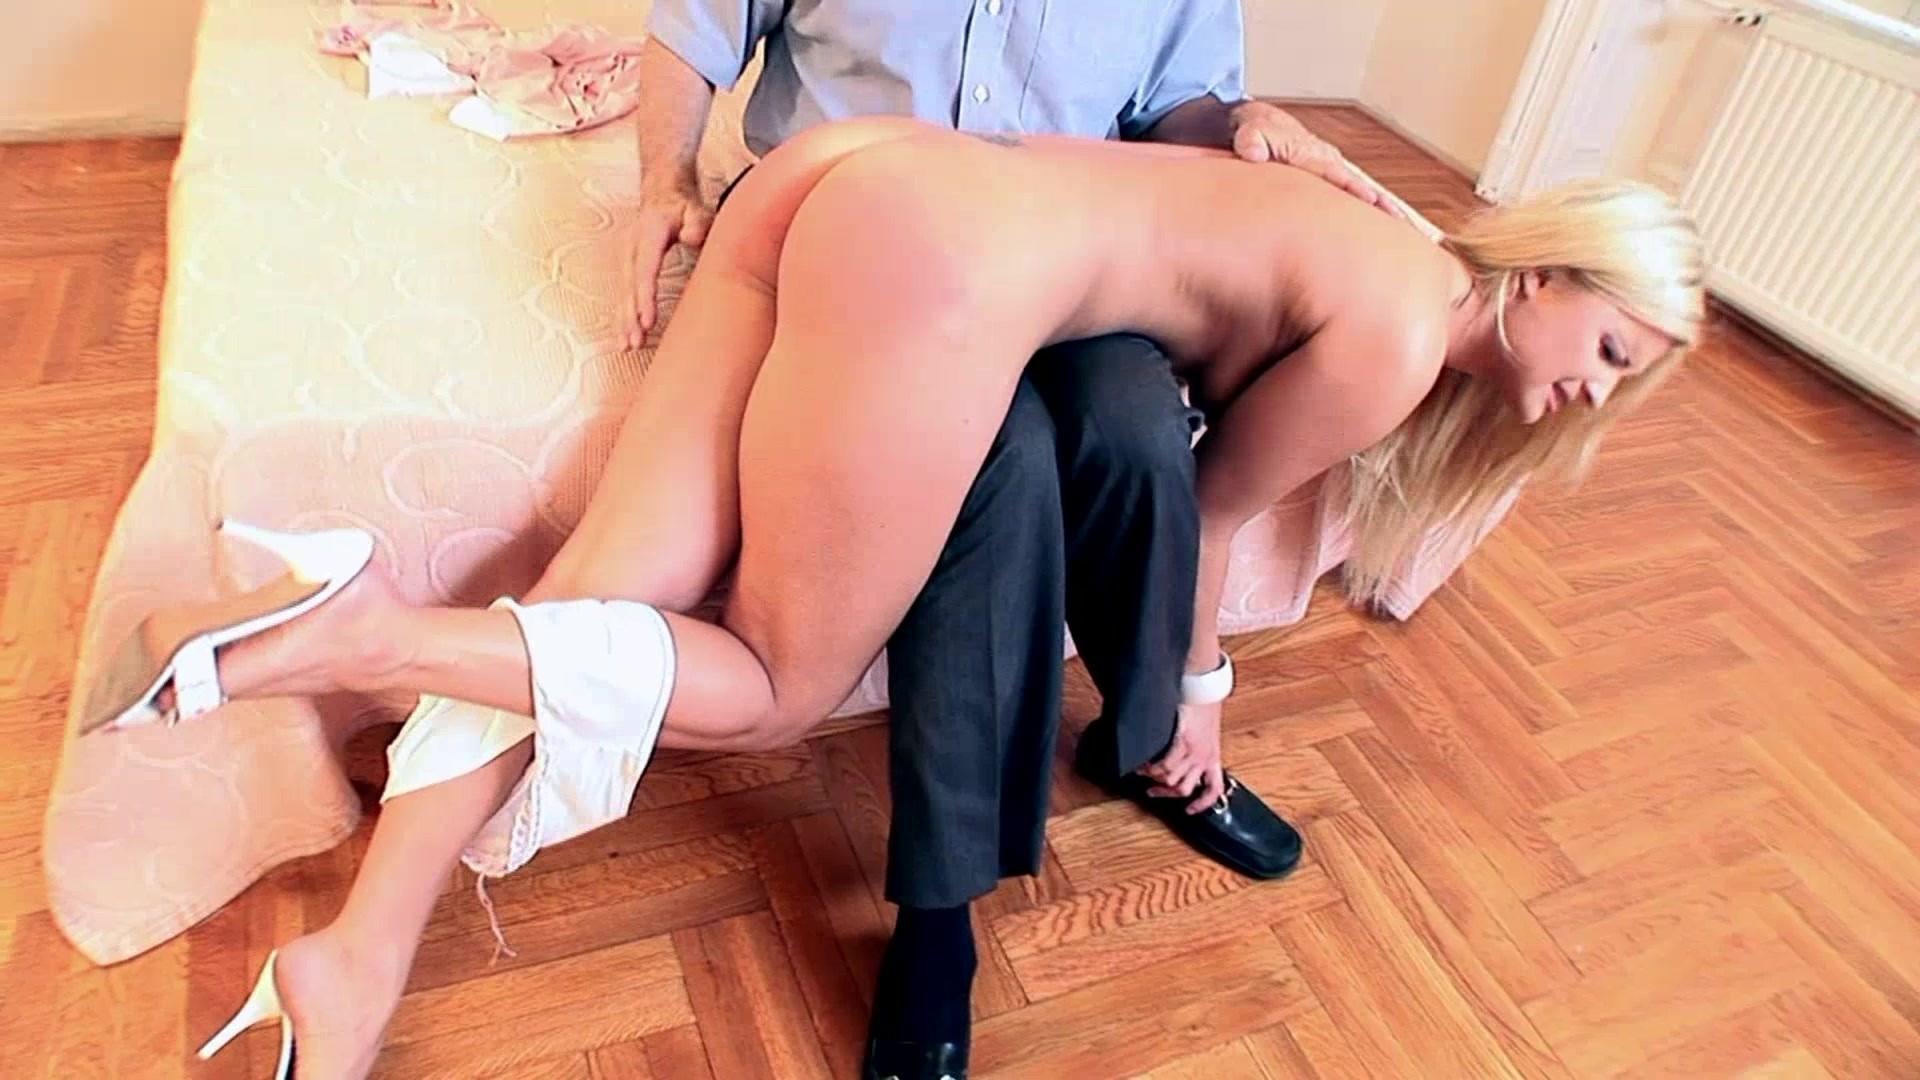 Mistress please spank me lesbians